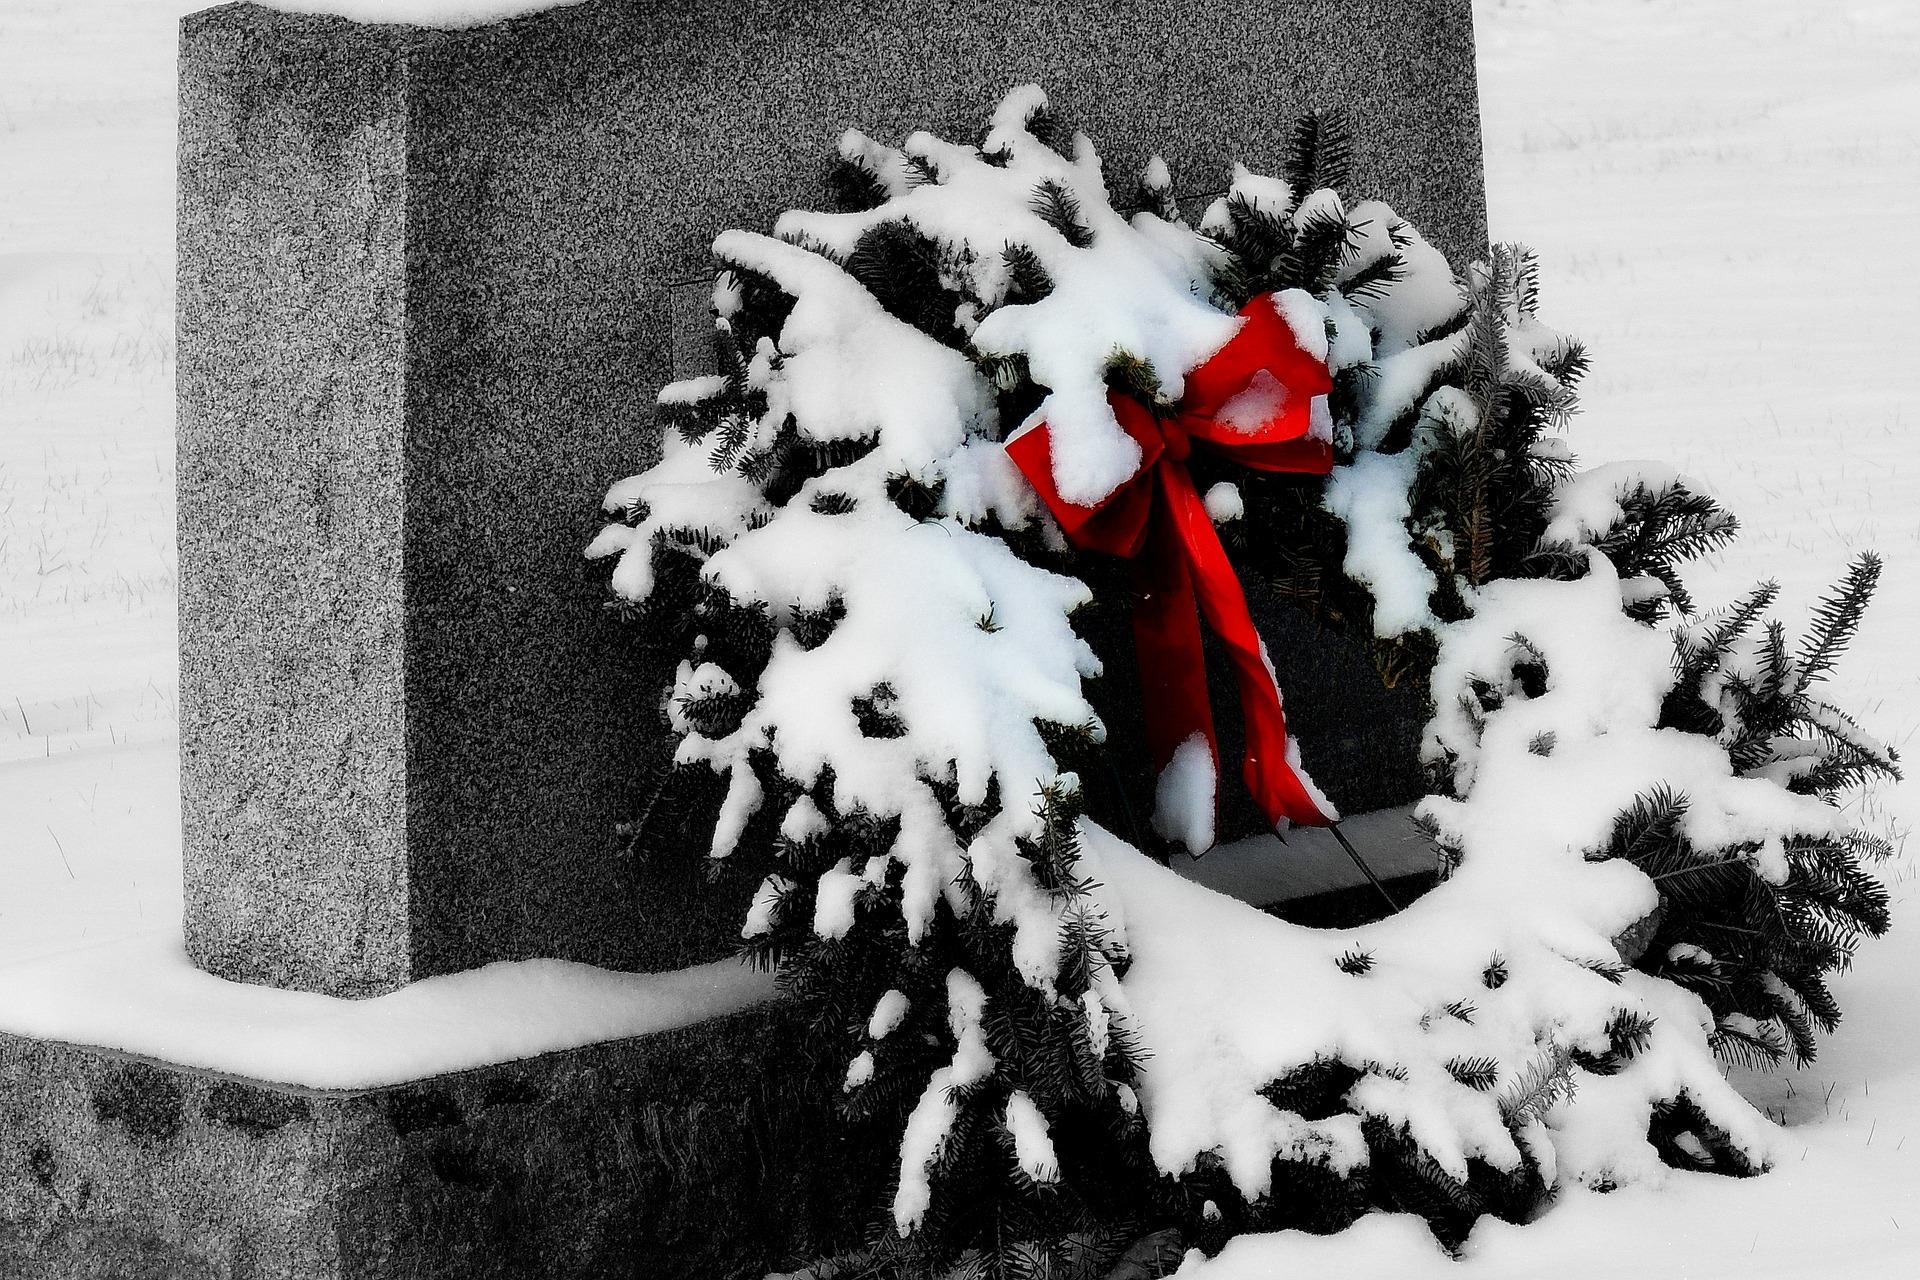 grave-1866193_1920